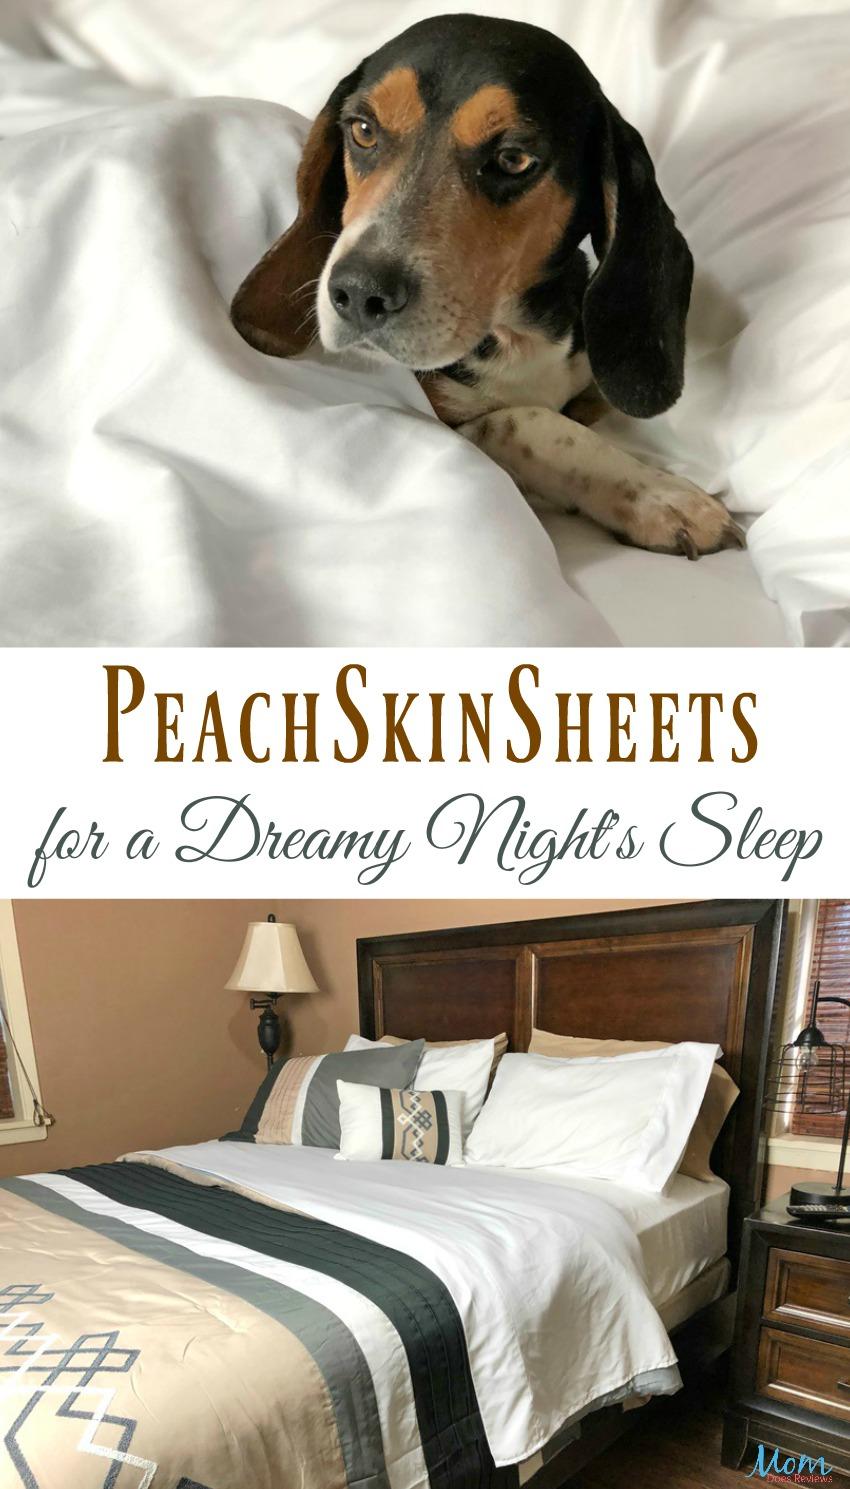 PeachSkinSheets for a Dreamy Night's Sleep #Sweet2019